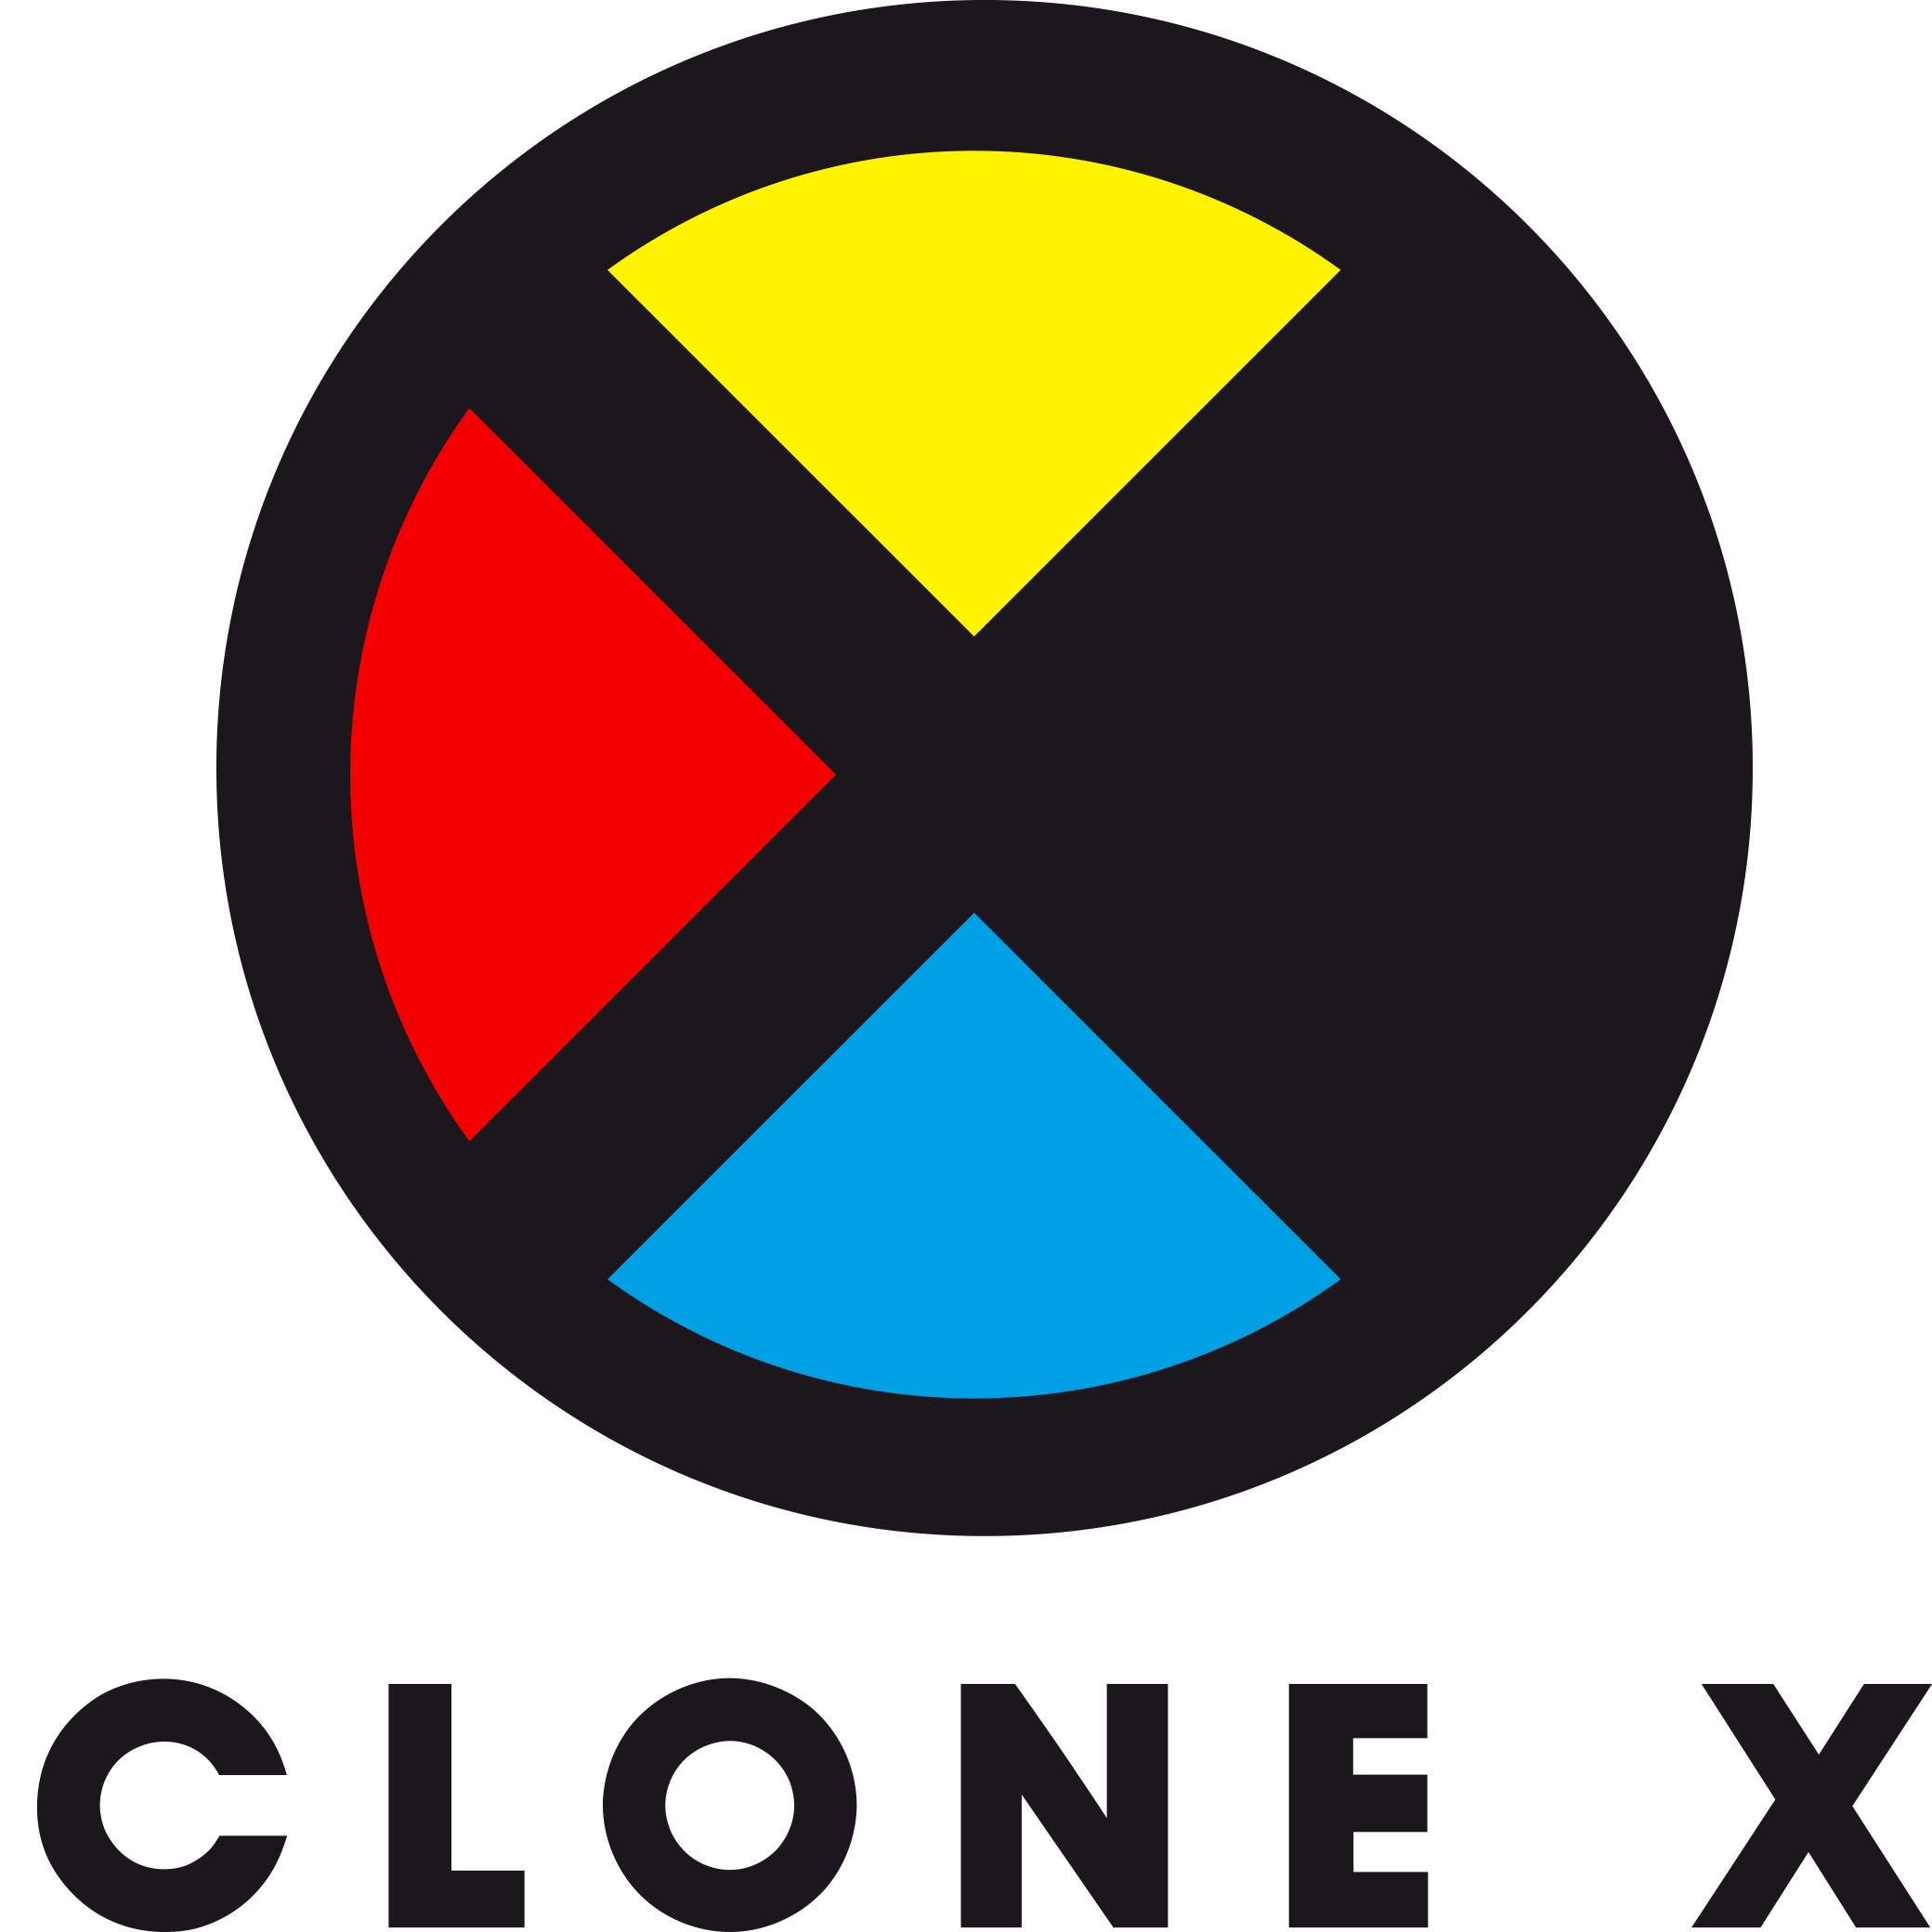 THE CLONEX